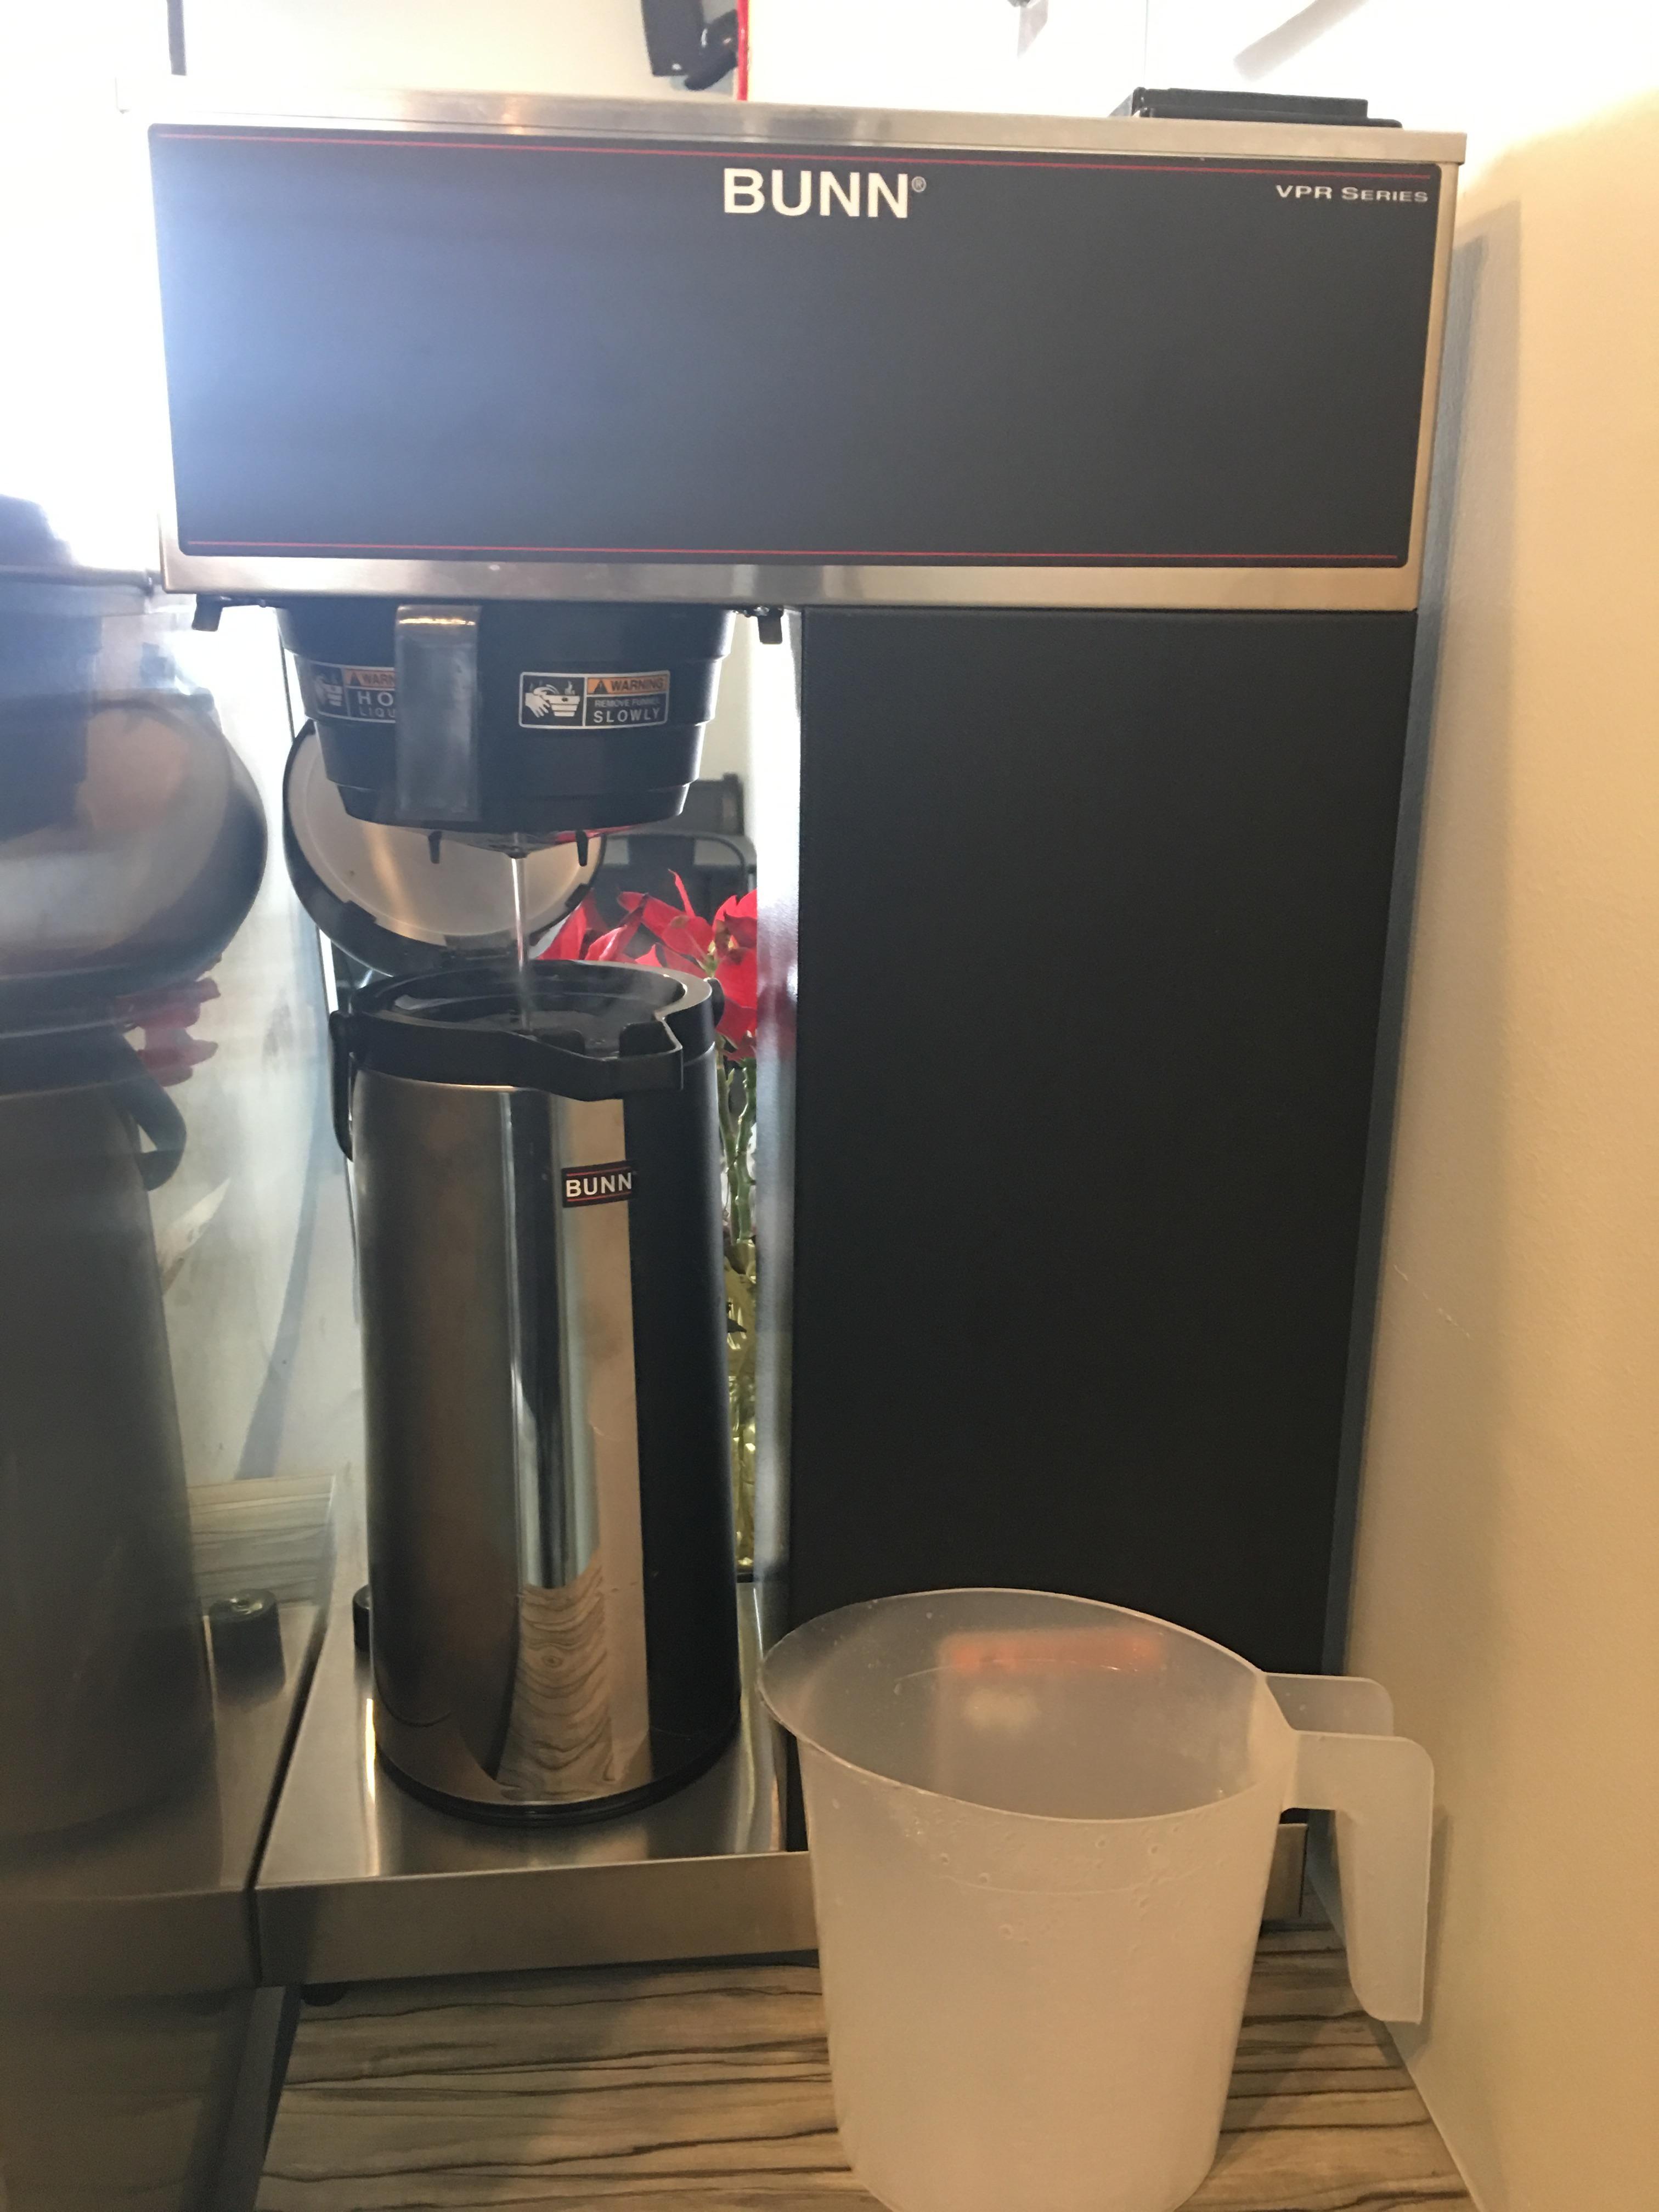 Bunn Coffee Maker Parts Diagram Bunn 0014 Vpr Aps Pourover Airpot Coffee Brewer with 2 2 Liter Of Bunn Coffee Maker Parts Diagram